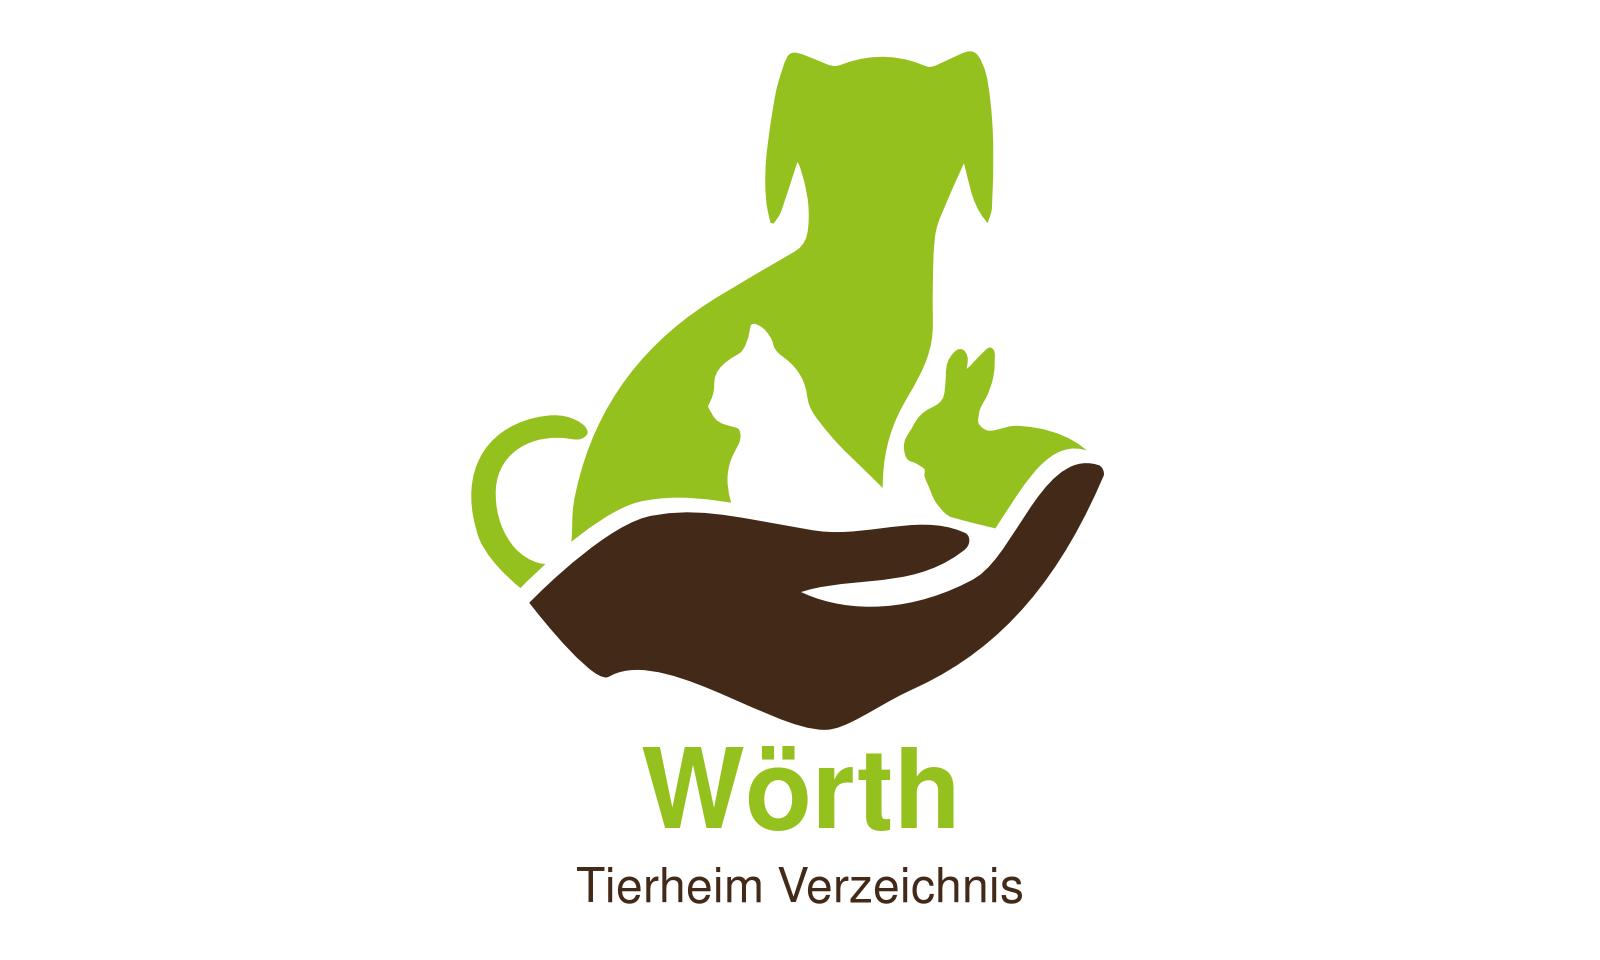 Tierheim Wörth